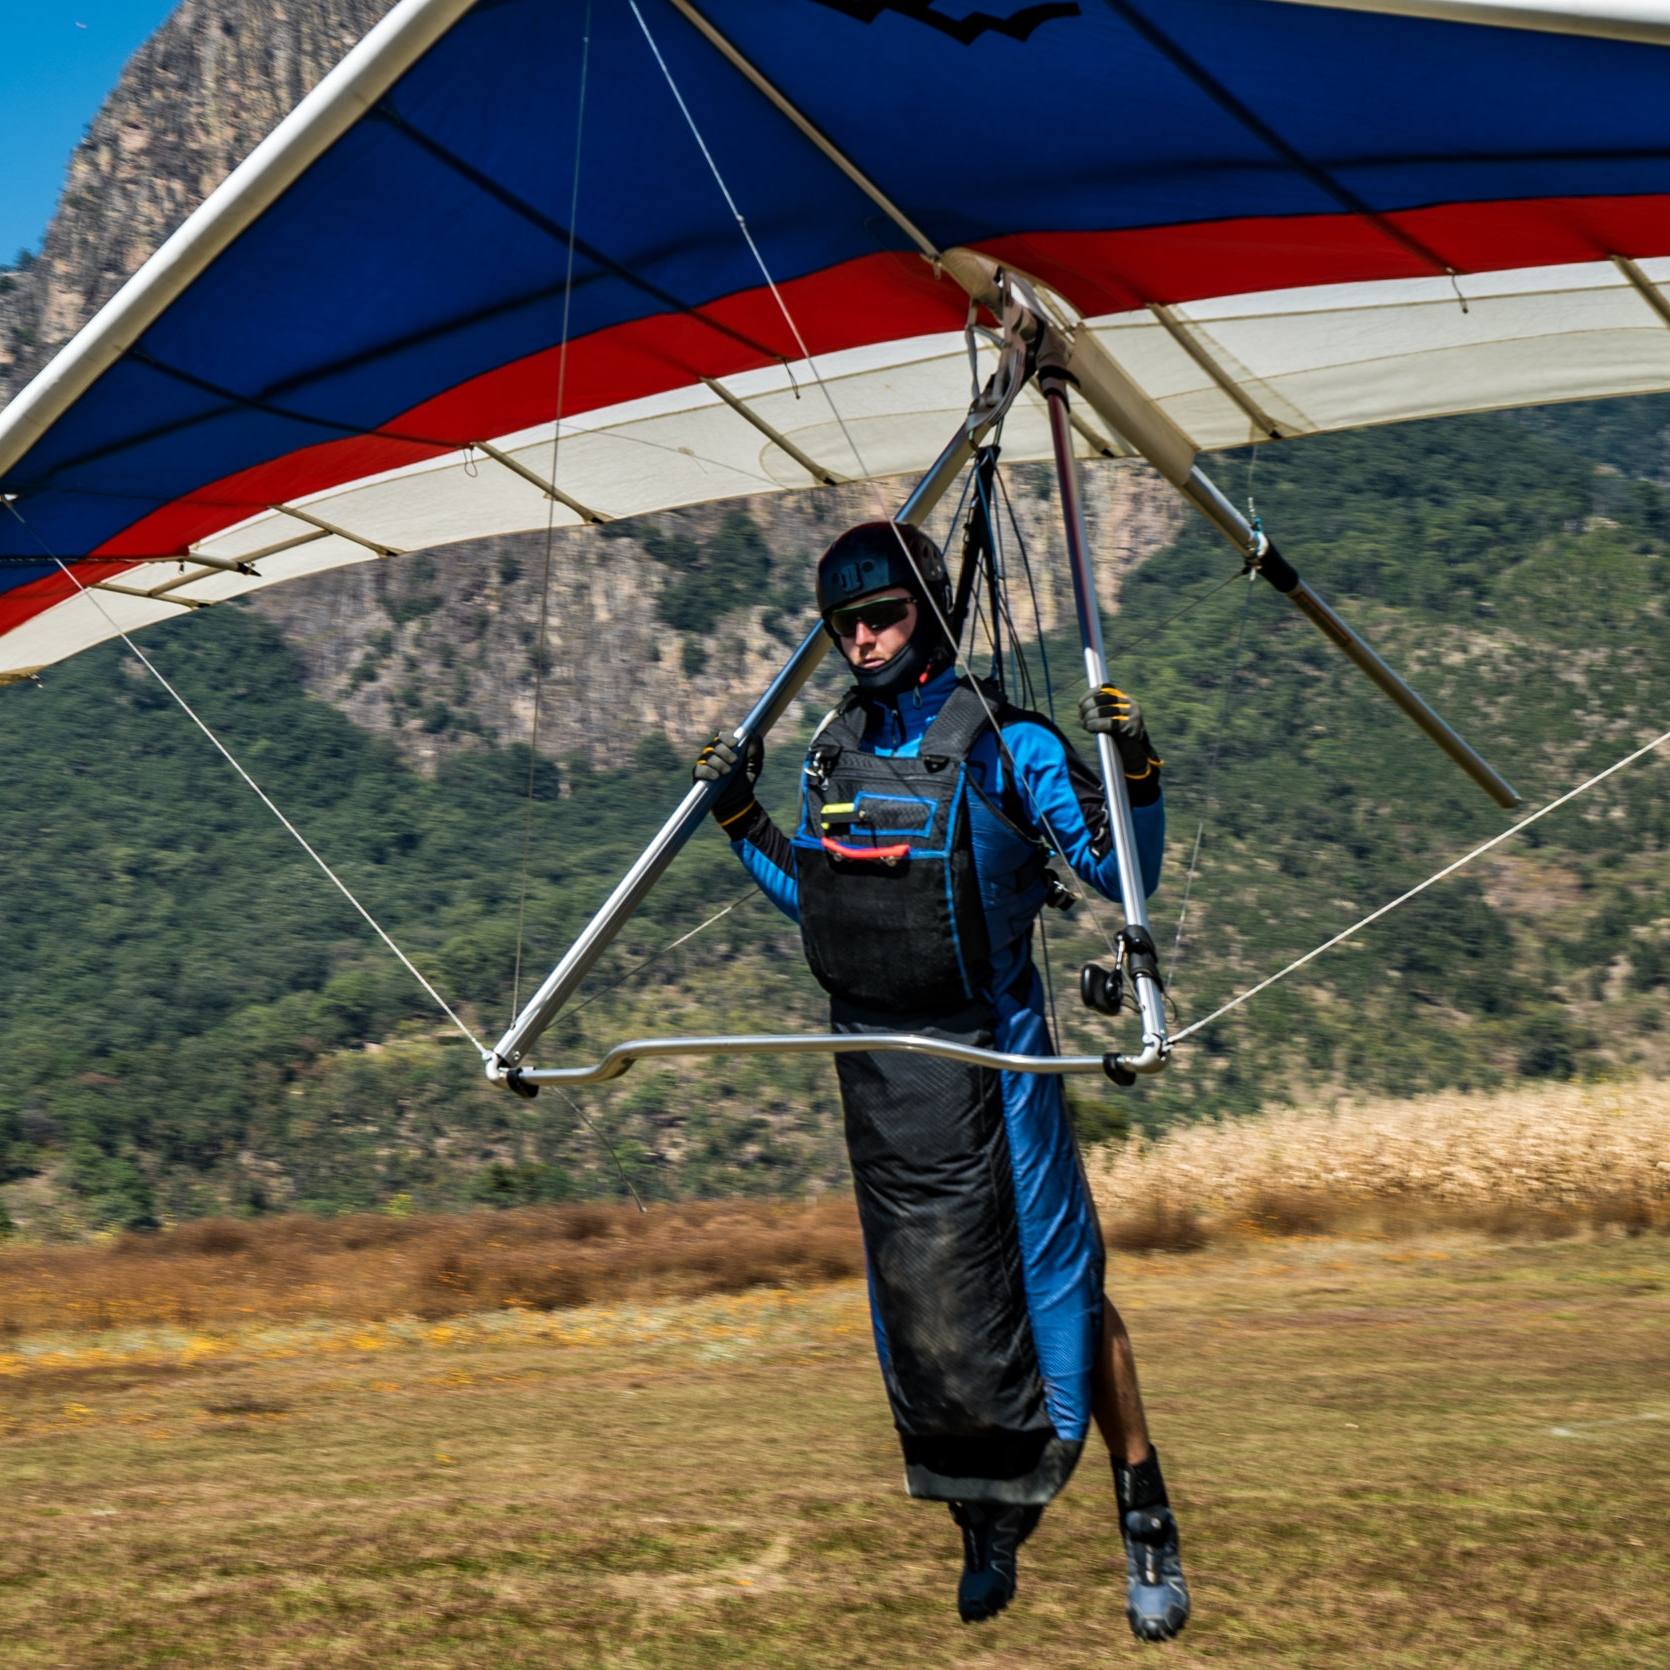 Phil - Hang Glider